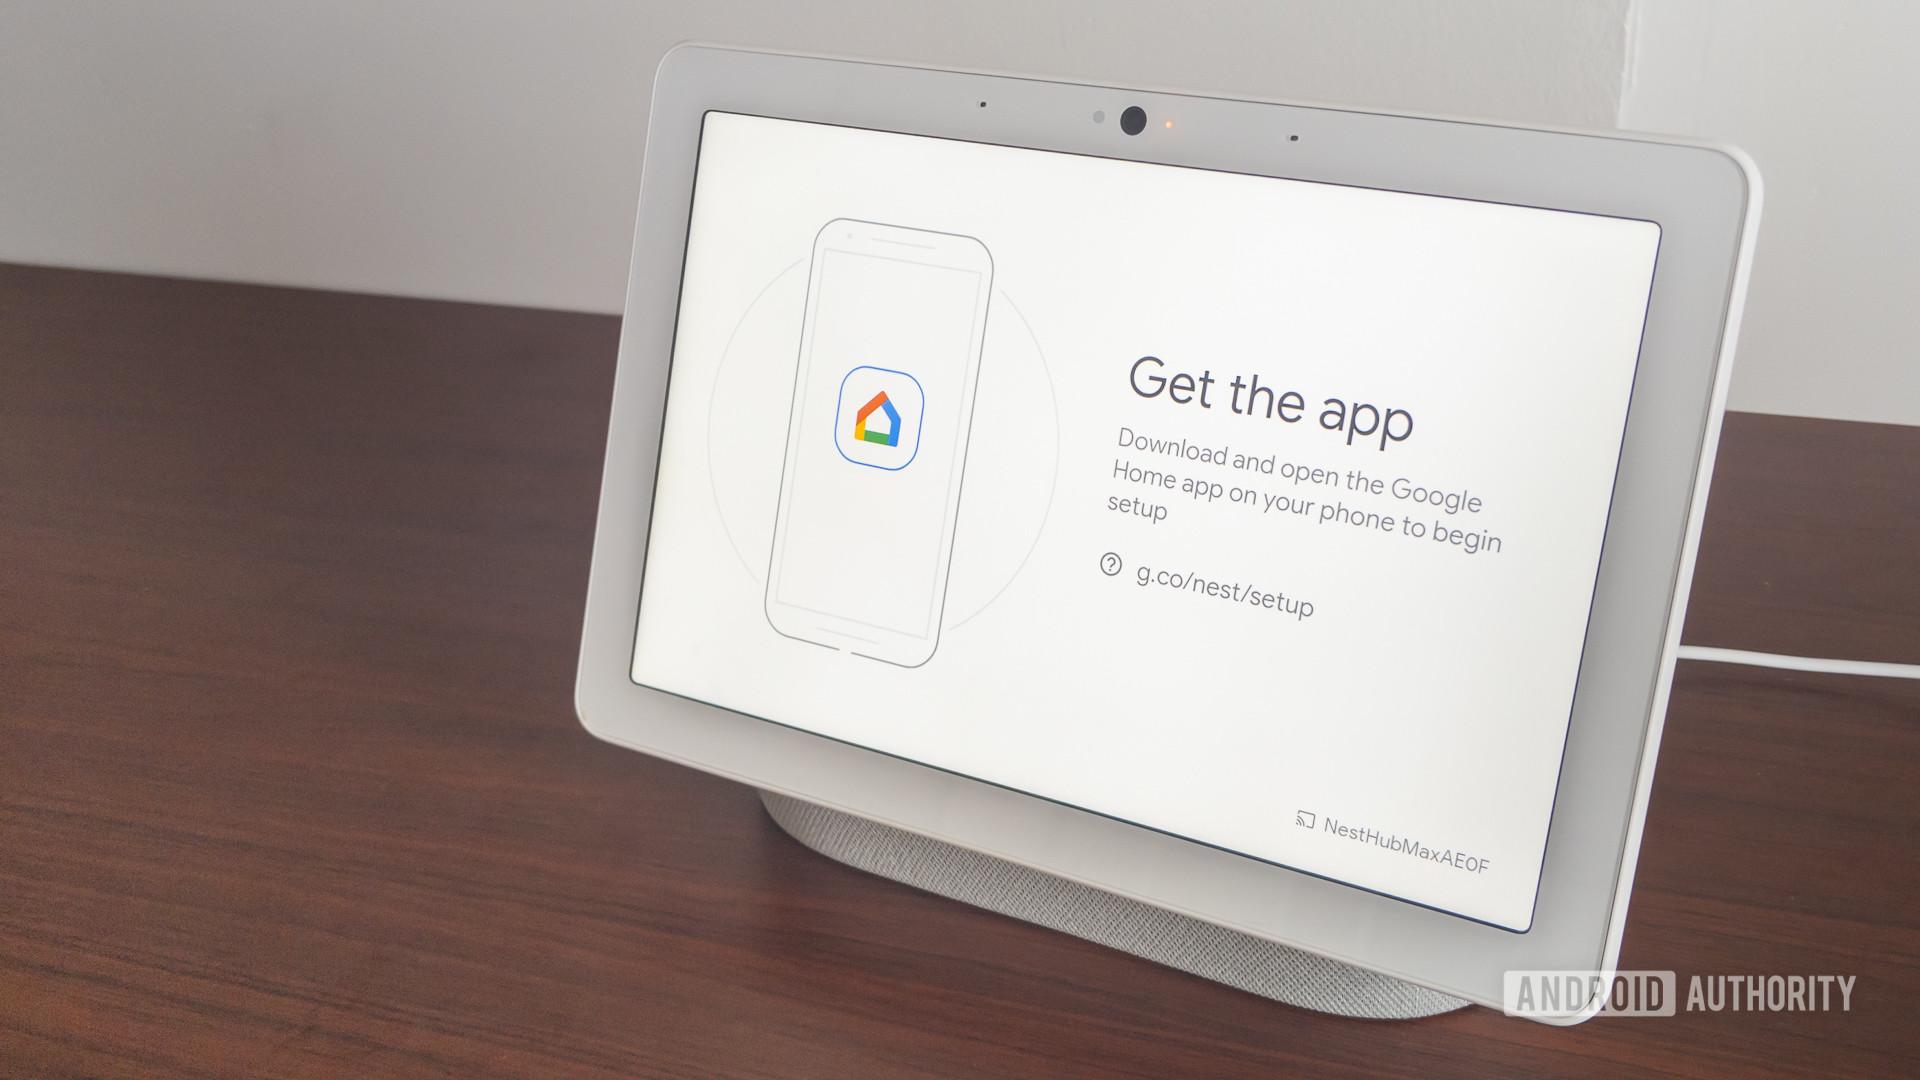 Google Home Hub Max app screen